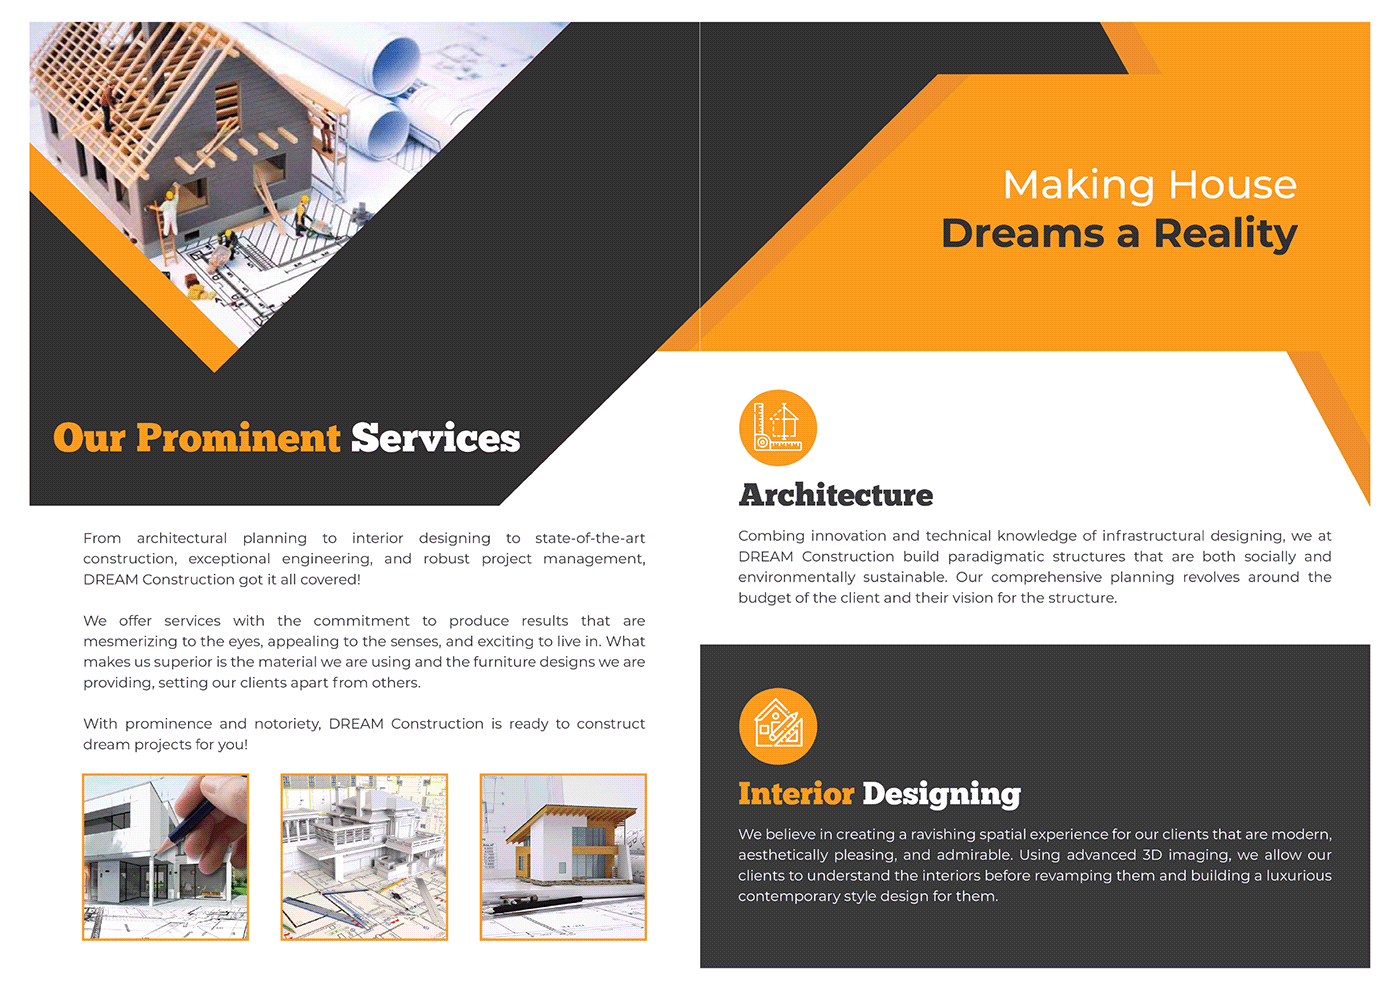 branding  Branding design brochure business company graphic graphic design  Illustrator mjsteadfast photoshop